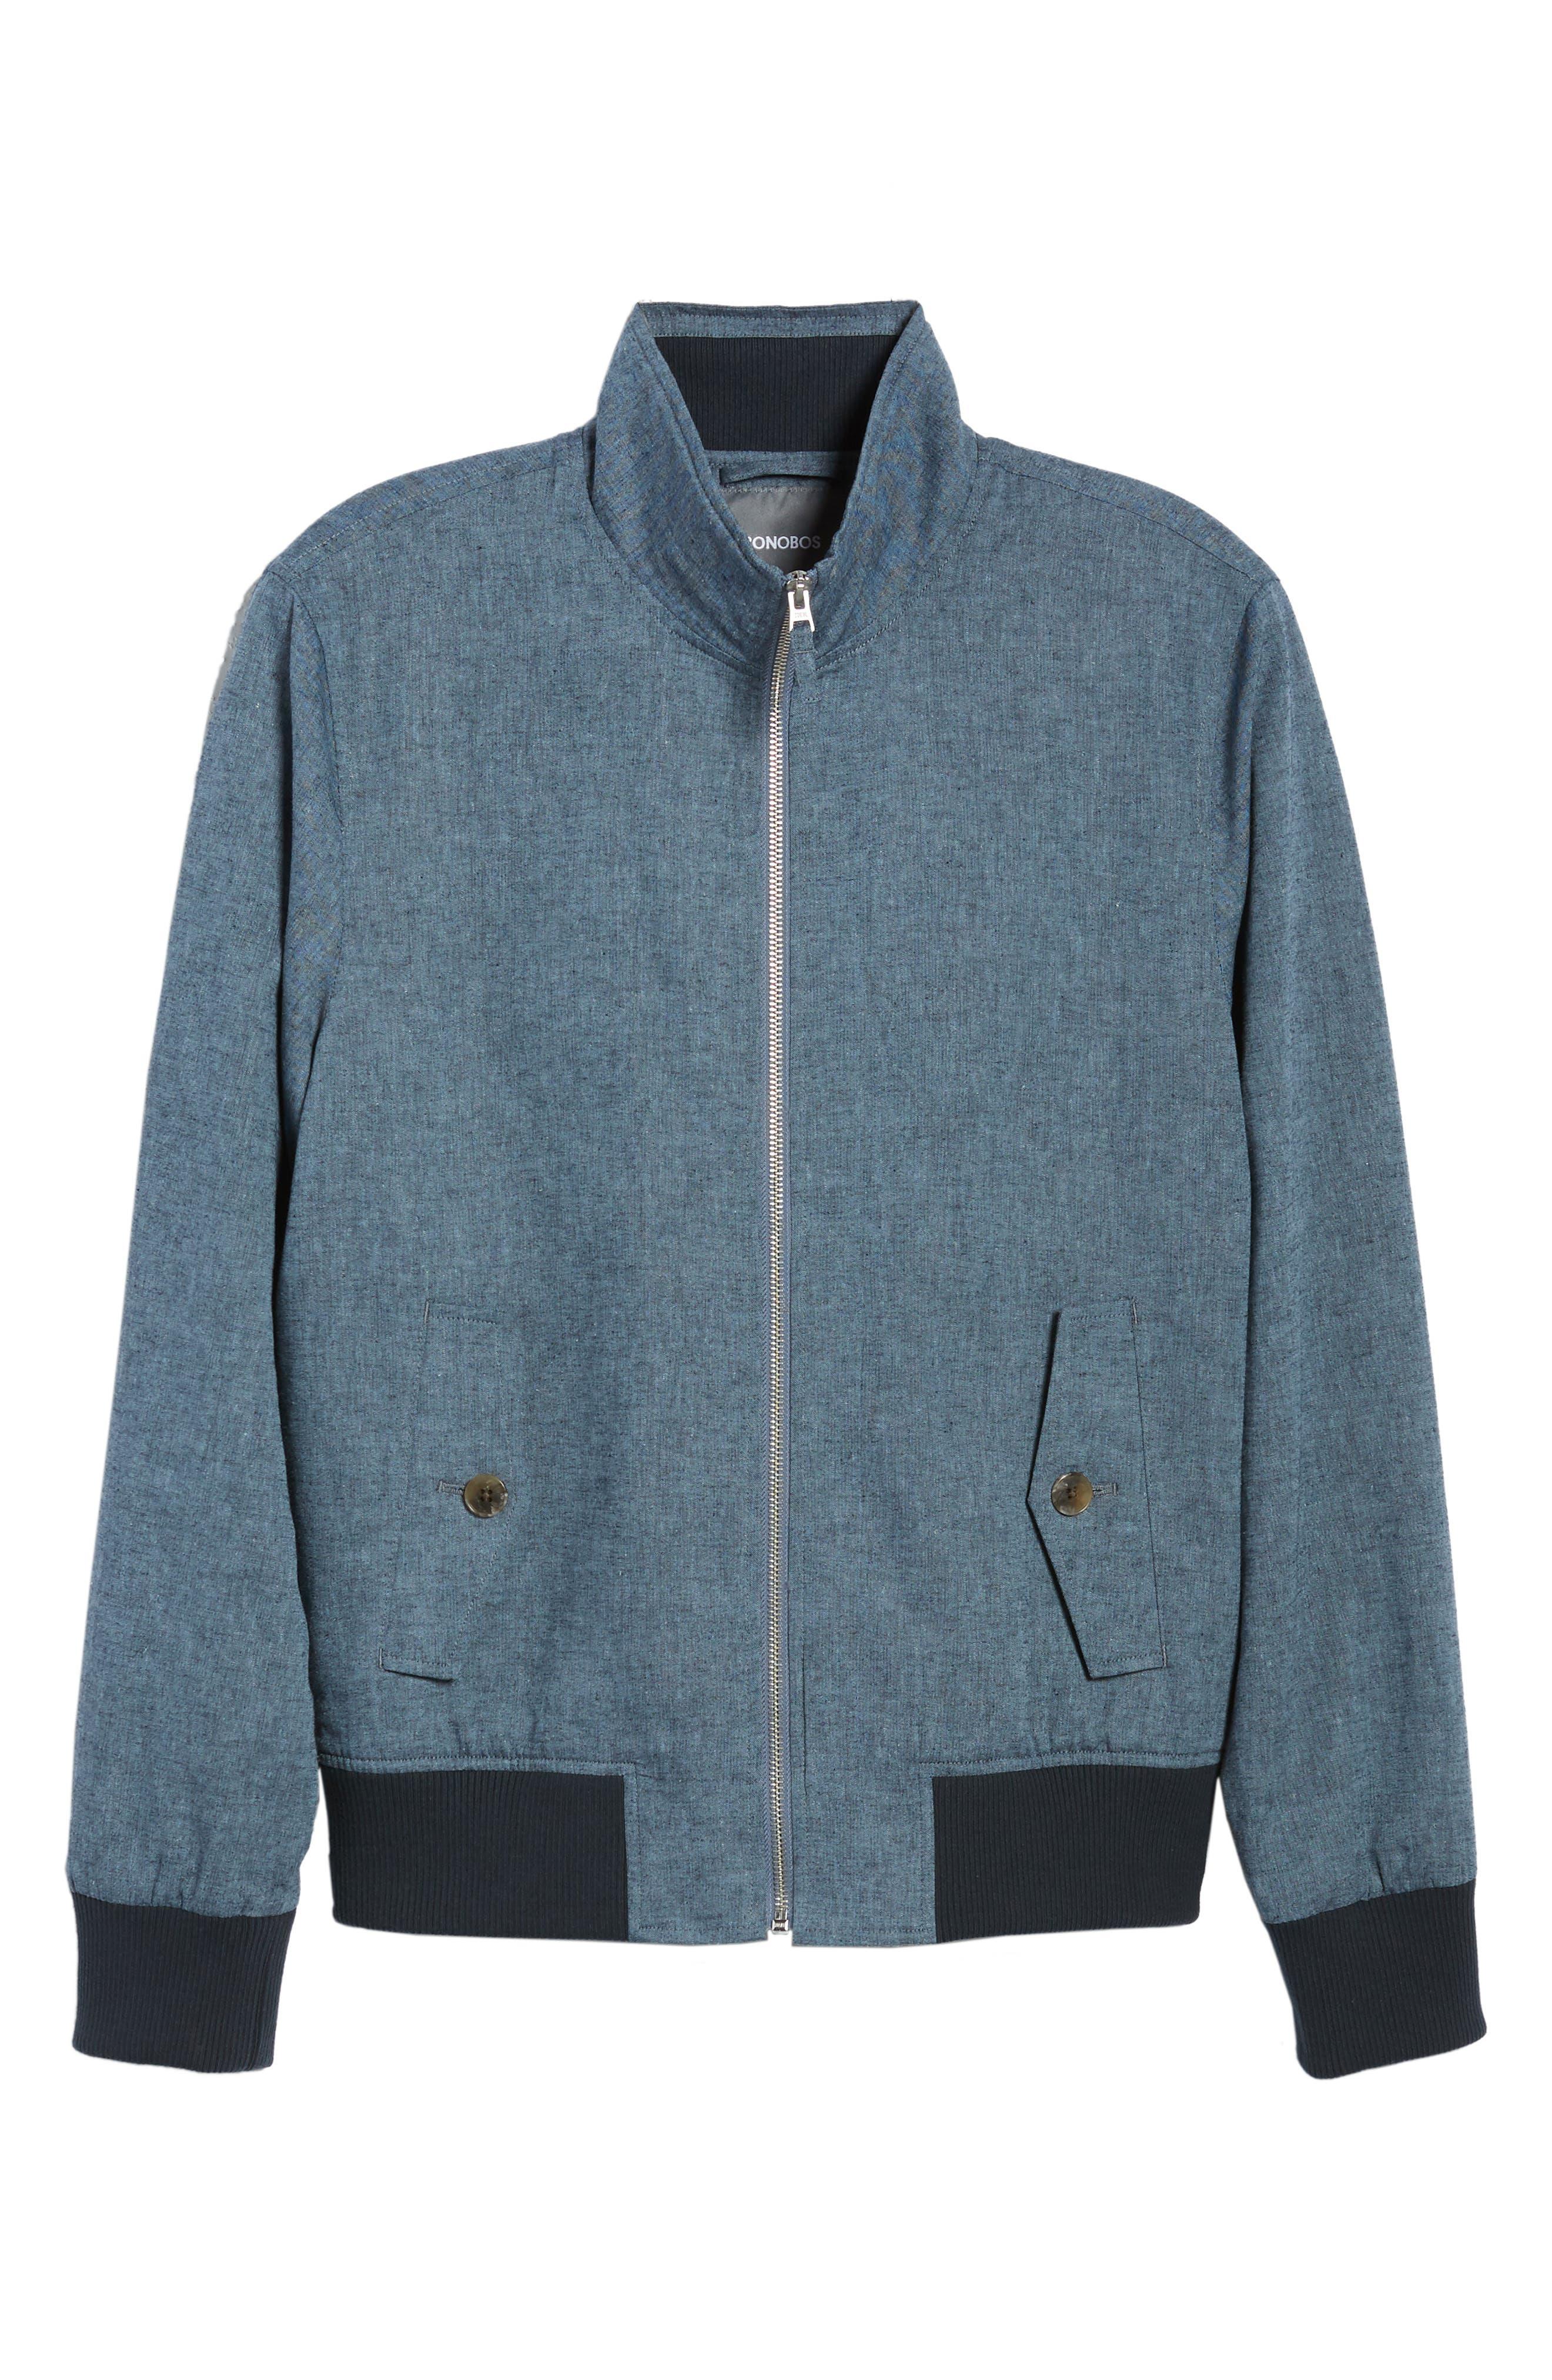 Linen & Cotton Chambray Bomber Jacket,                             Alternate thumbnail 5, color,                             400